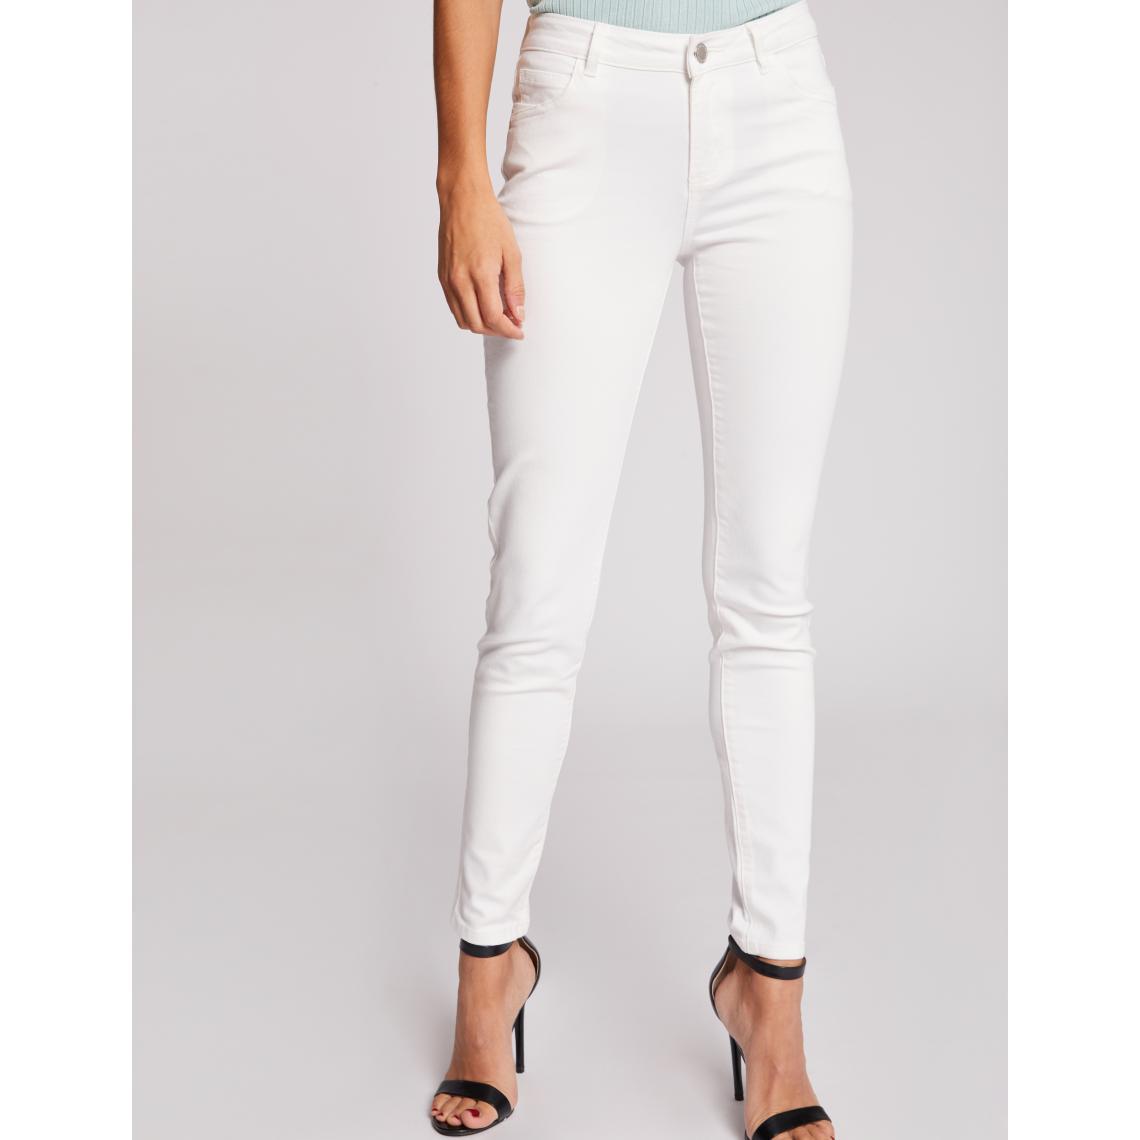 Pantalon droit taille standard - Morgan - Modalova